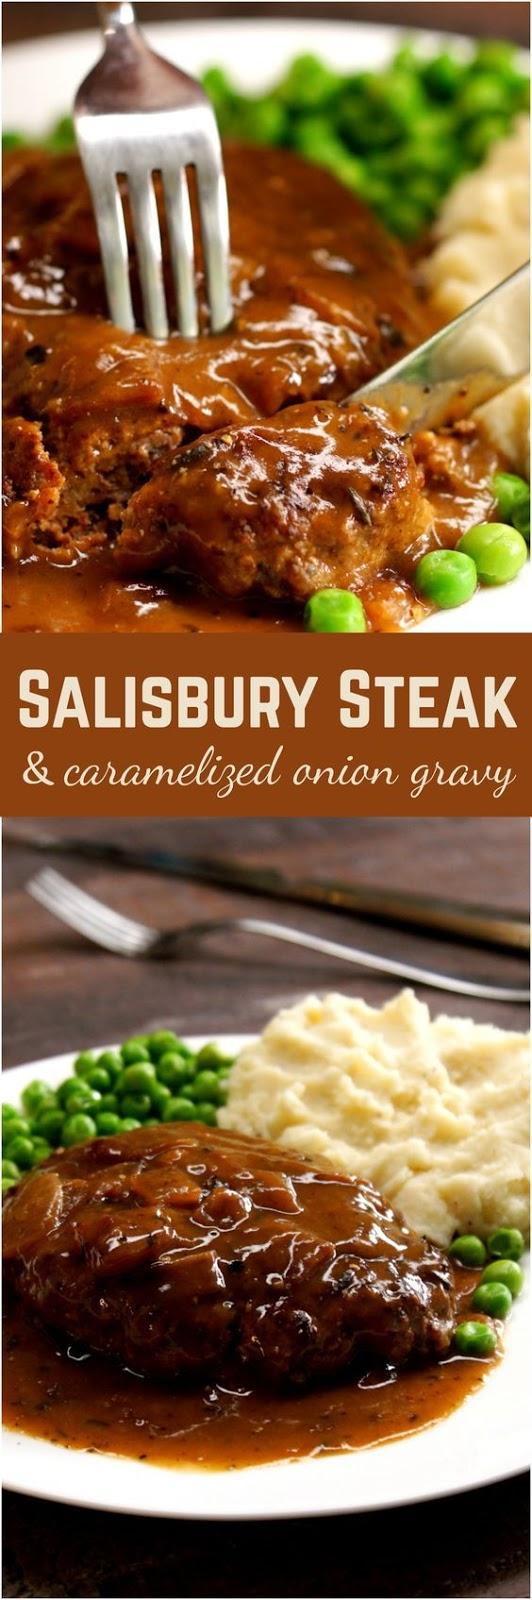 Amazing Salisbury Steak Recipe #salisbury #steak #steakrecipes #dinnerideas #dinnerrecipes #easydinnerrecipes